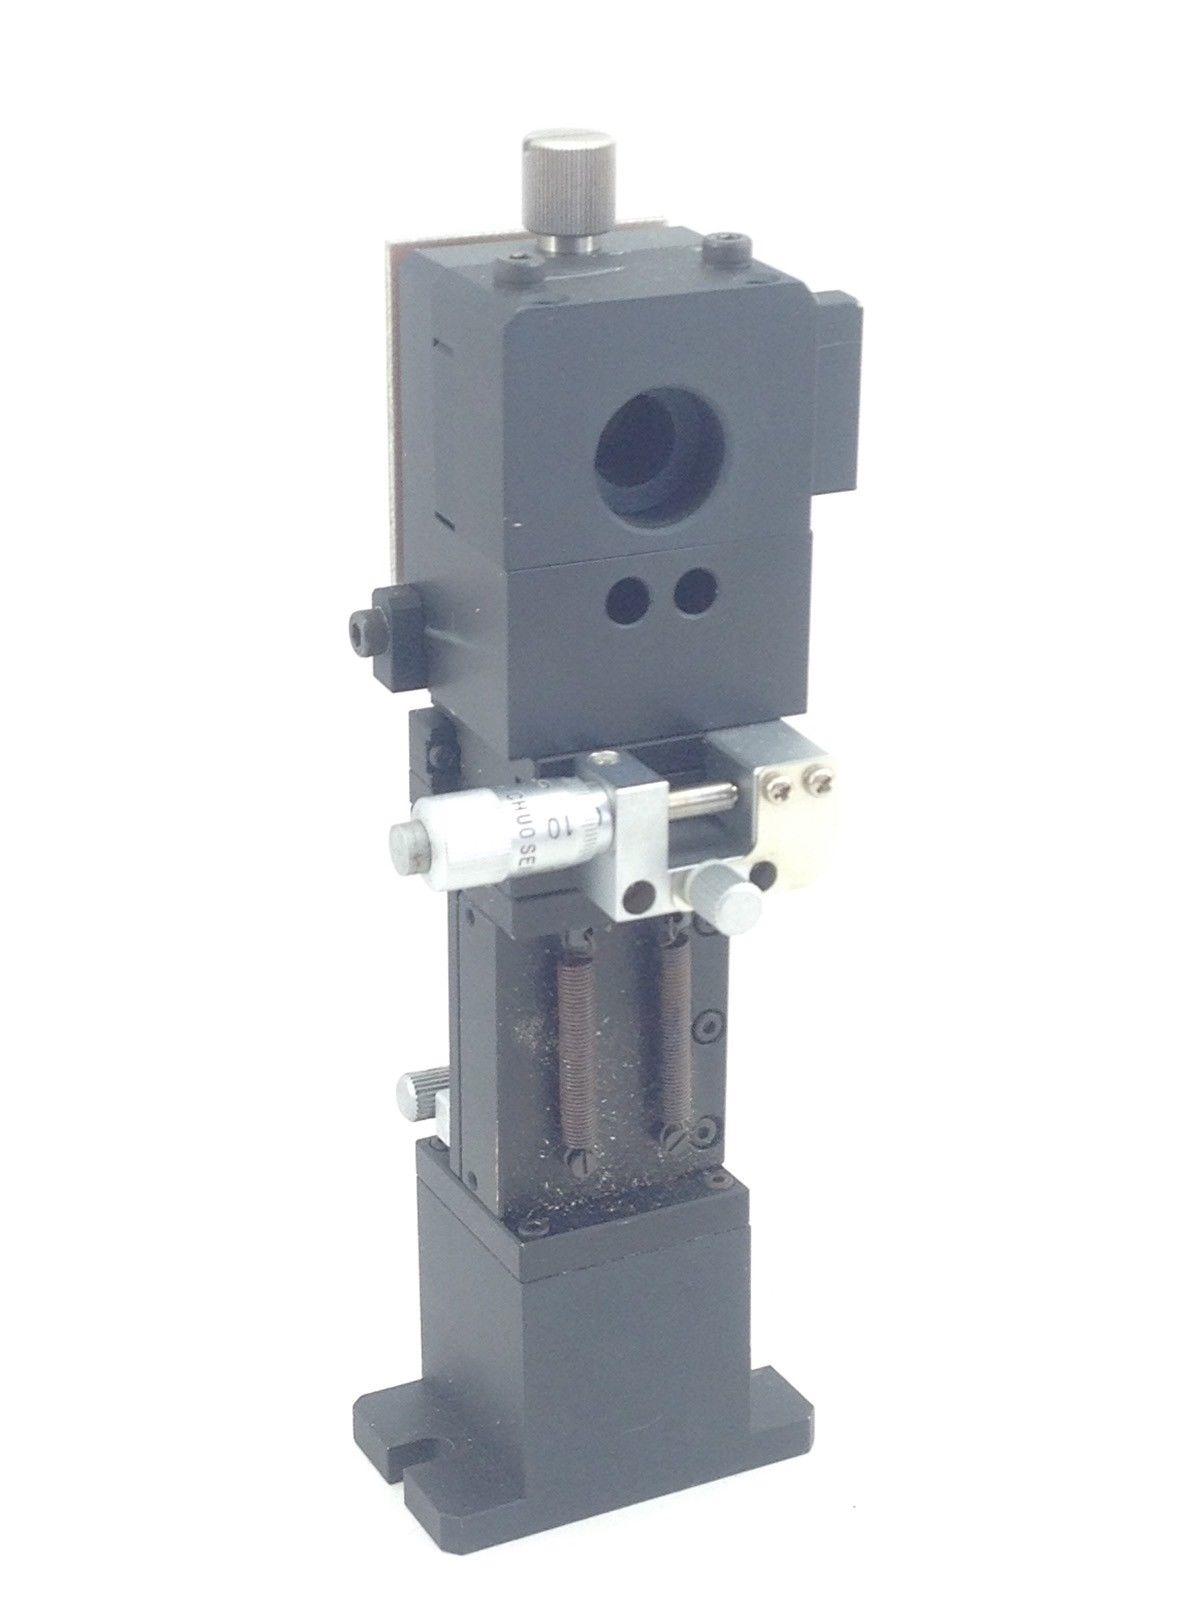 OPTOMECHANICAL ASSY W/ 021128 MICRO-CONTROLLER BOARD (H330) 6